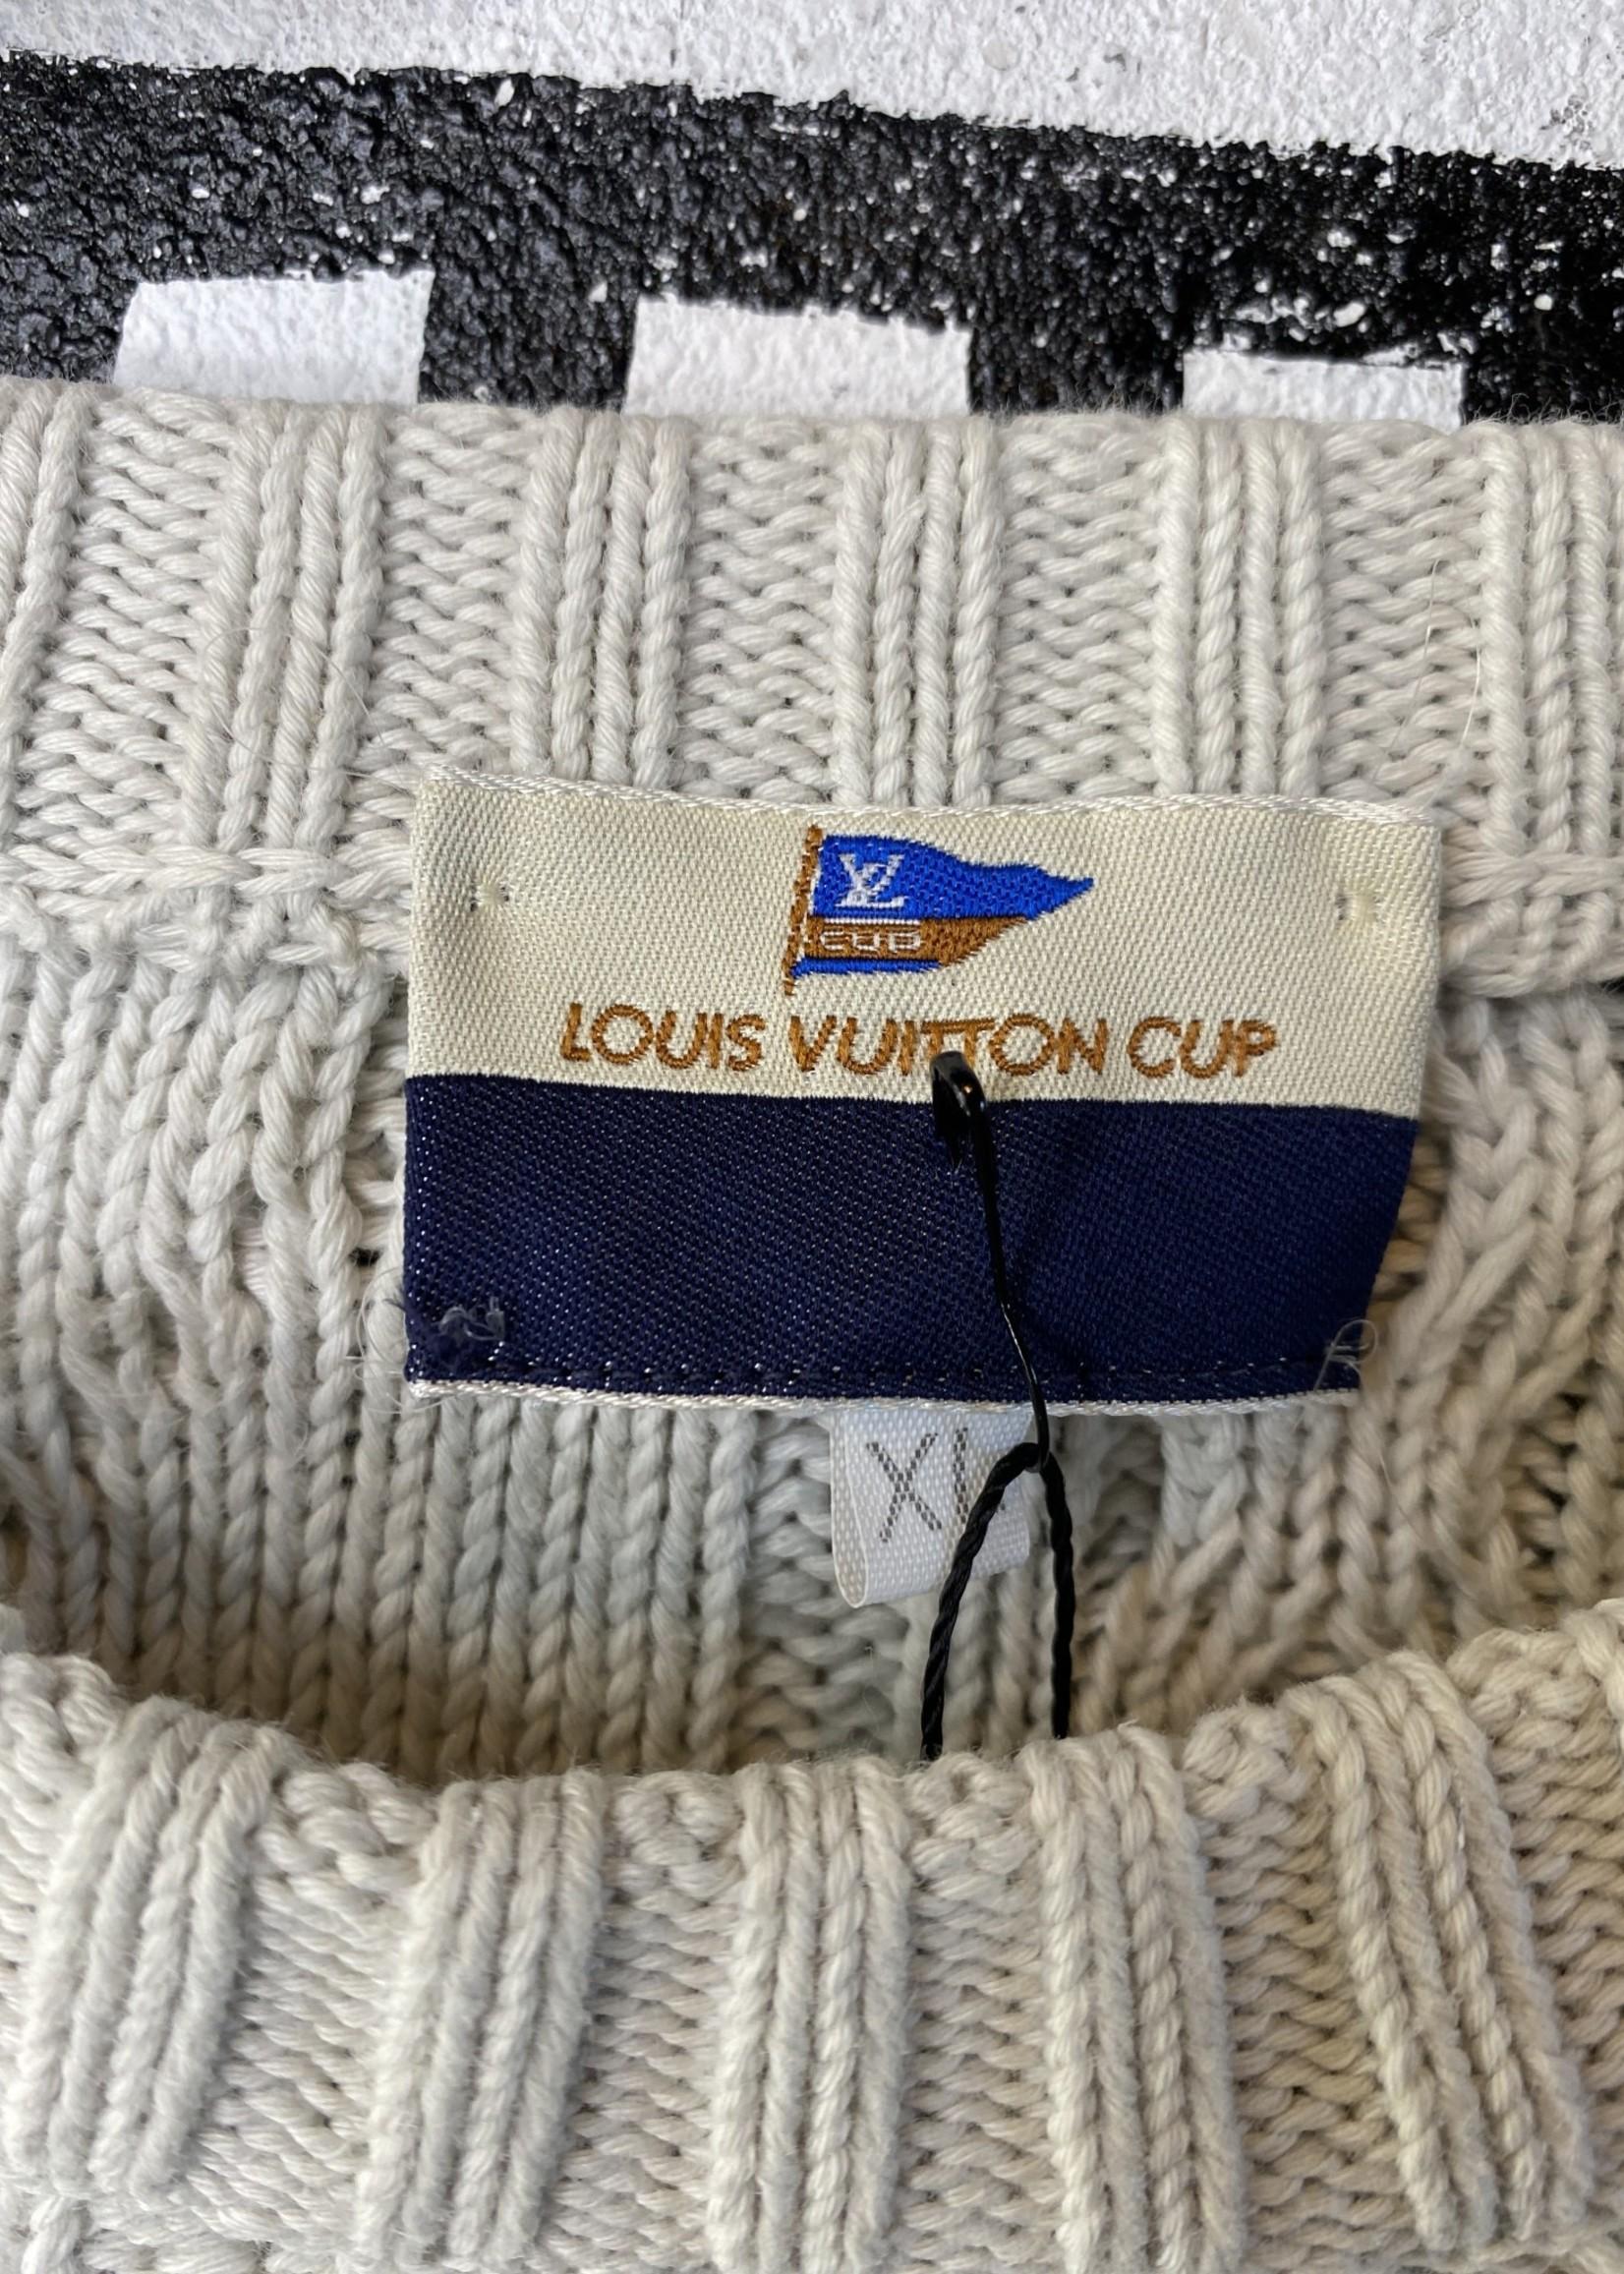 Louis Vuitton Cup Knit Sweater XL